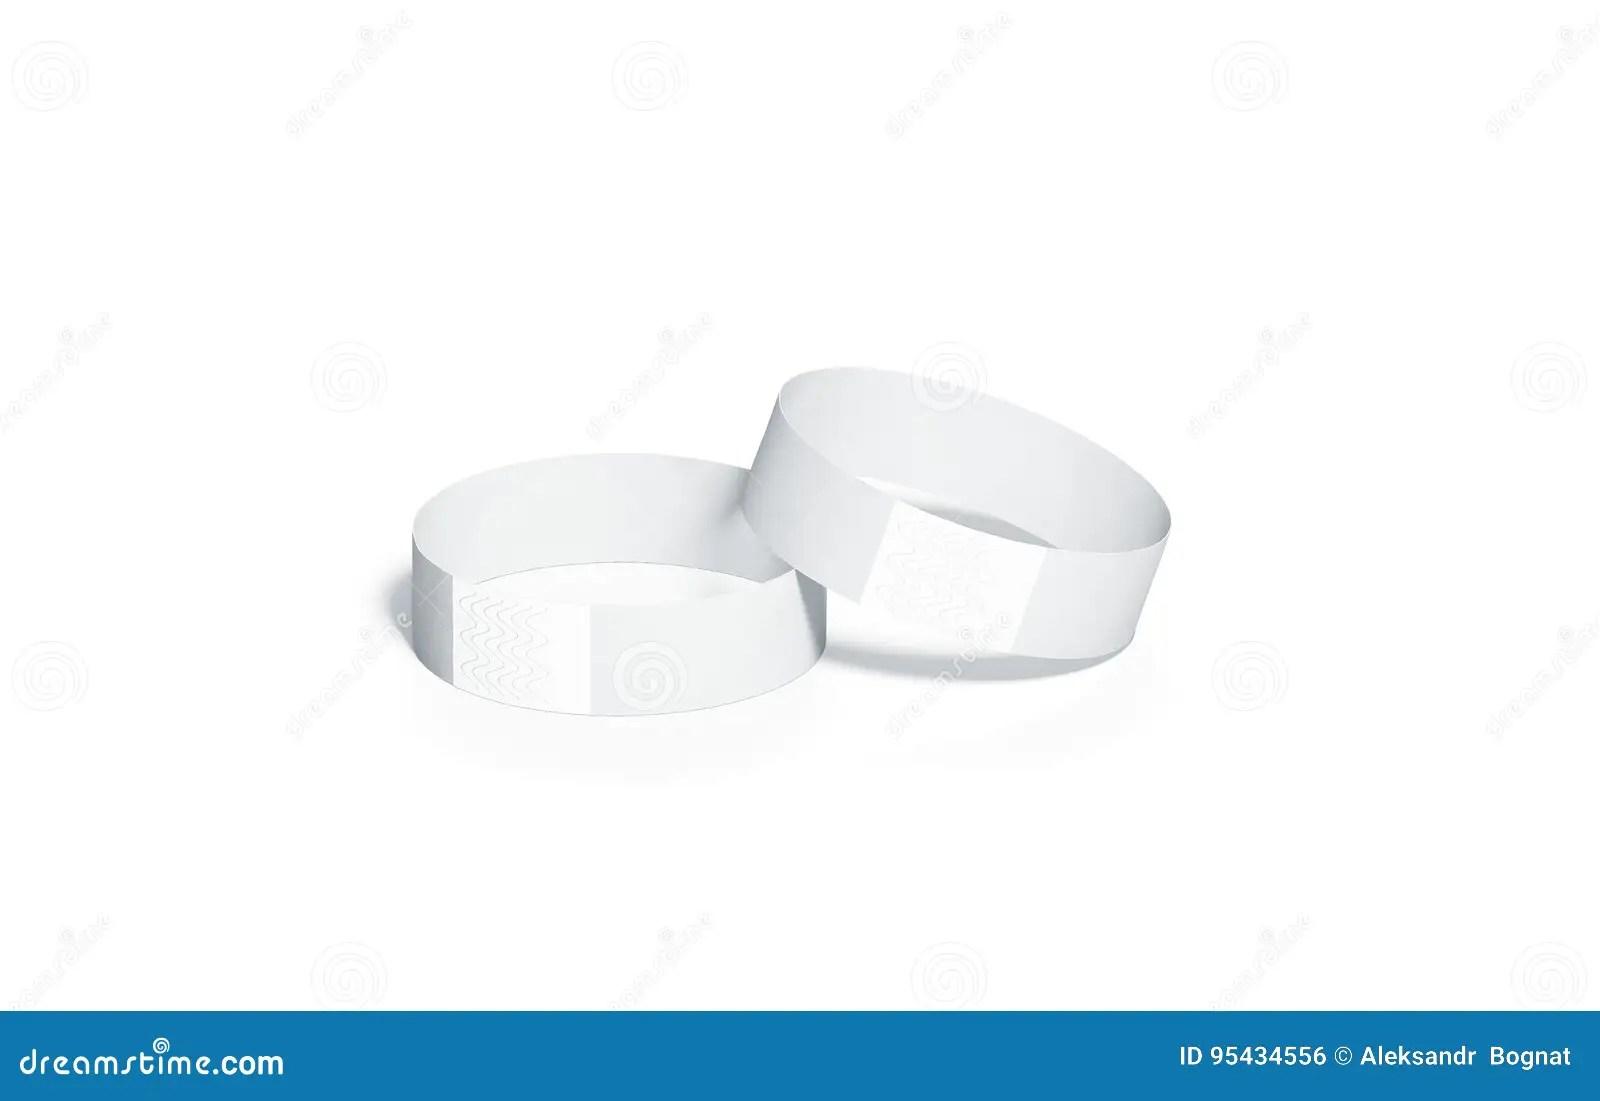 Blank White Paper Wristbands Mockups, Stock Illustration